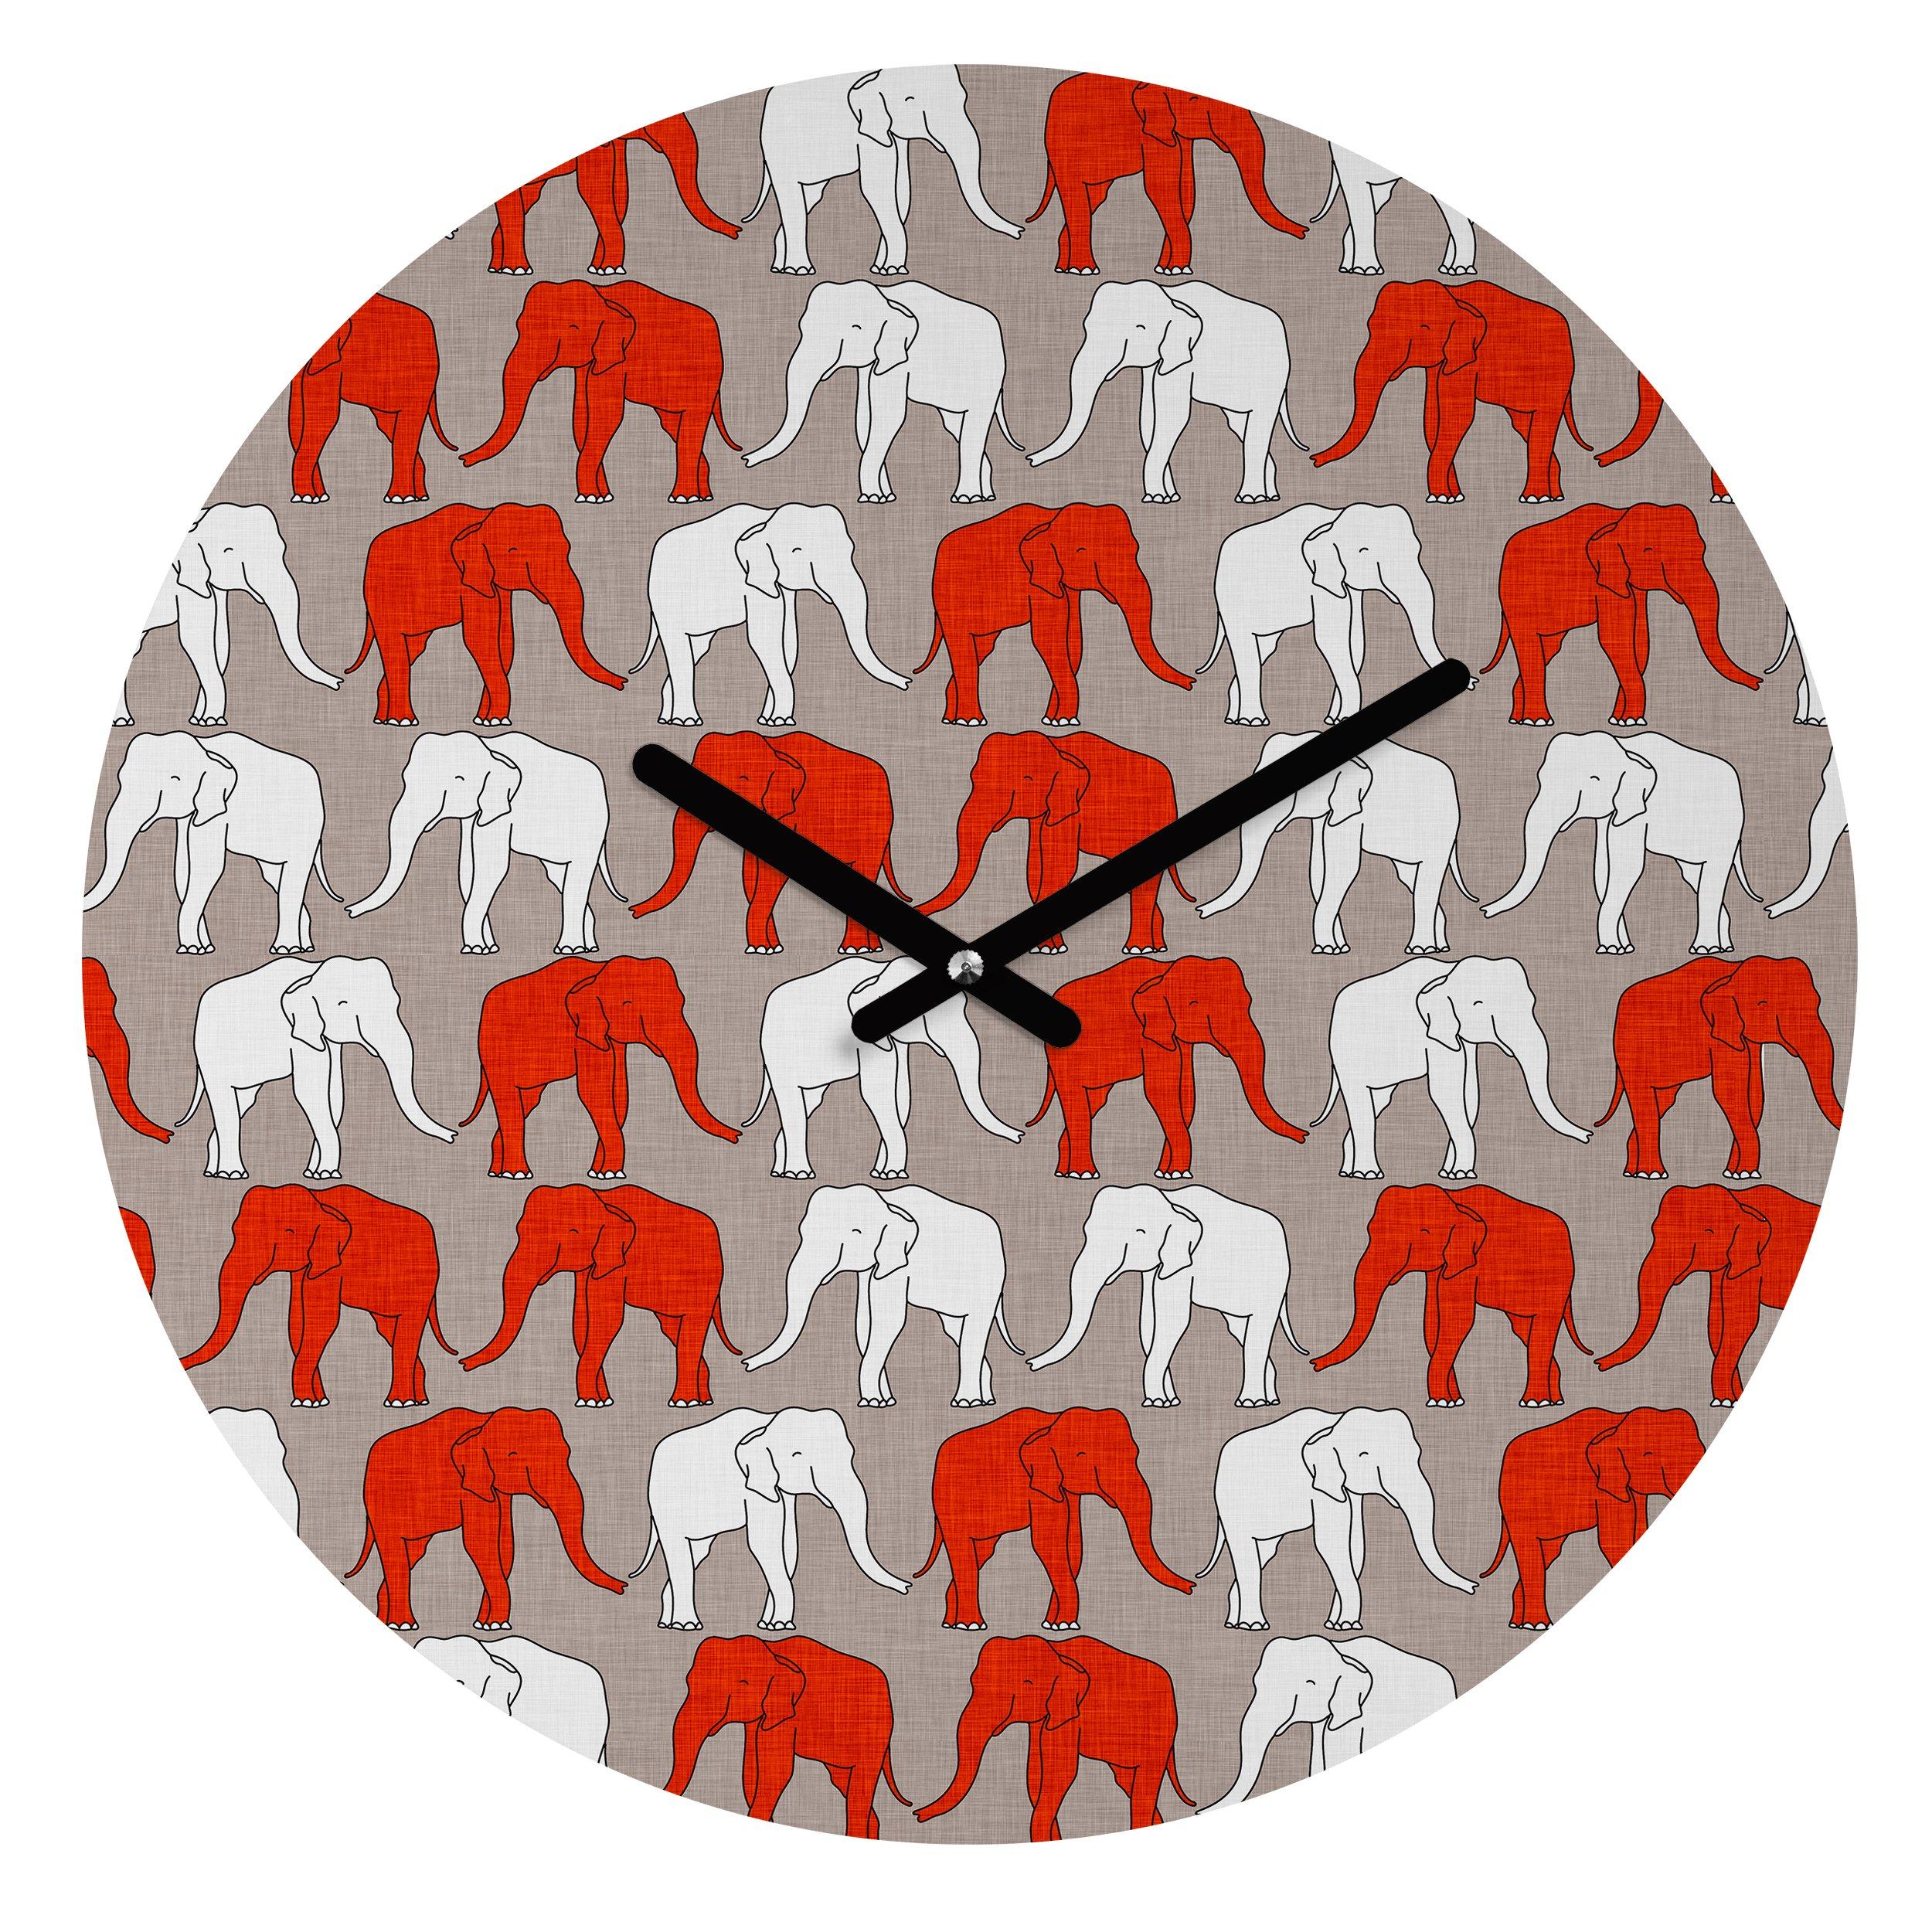 Deny Designs Holli Zollinger,  Elephant Walk , Round Clock, Round, 12'' by Deny Designs